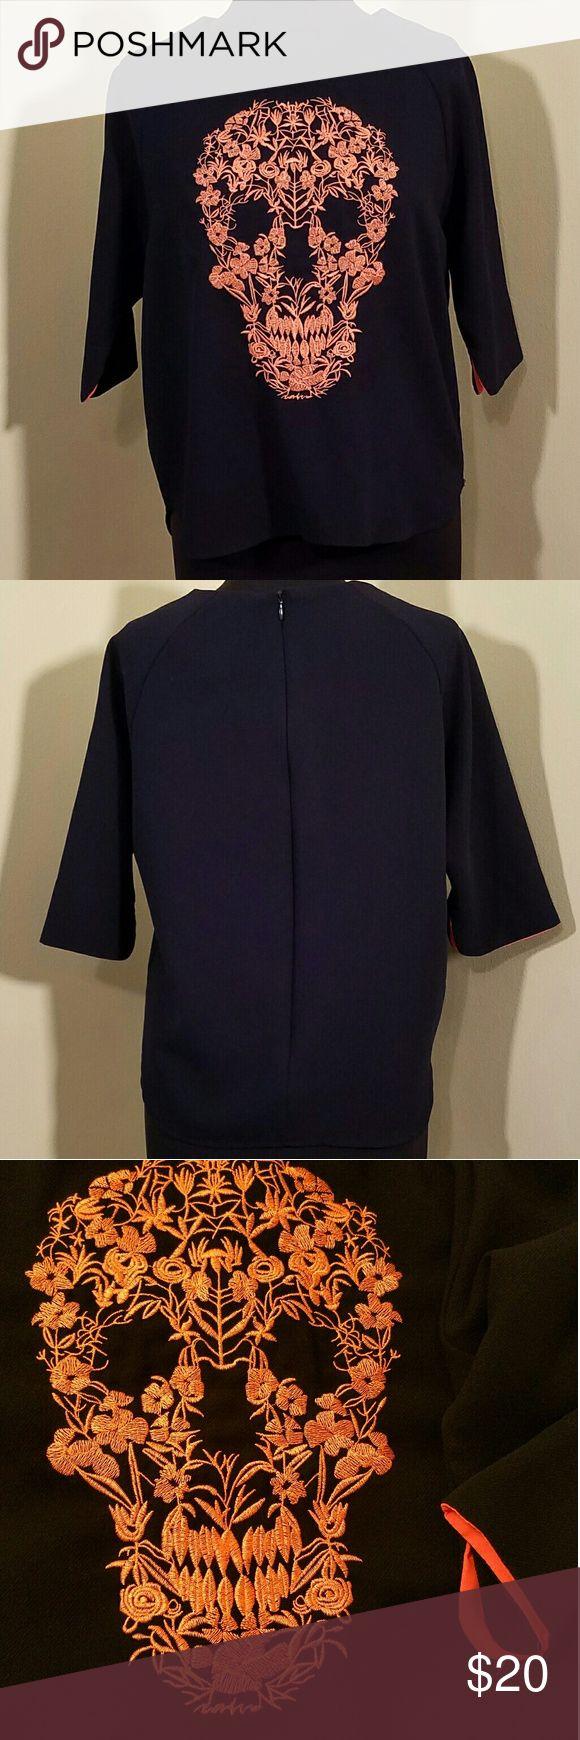 Navy 3/4 Shirt w/Orange Sugar Skull, Small Navy and orange sugar skull, 3/4 sleeve, zipper back shirt. spicy color Tops Blouses